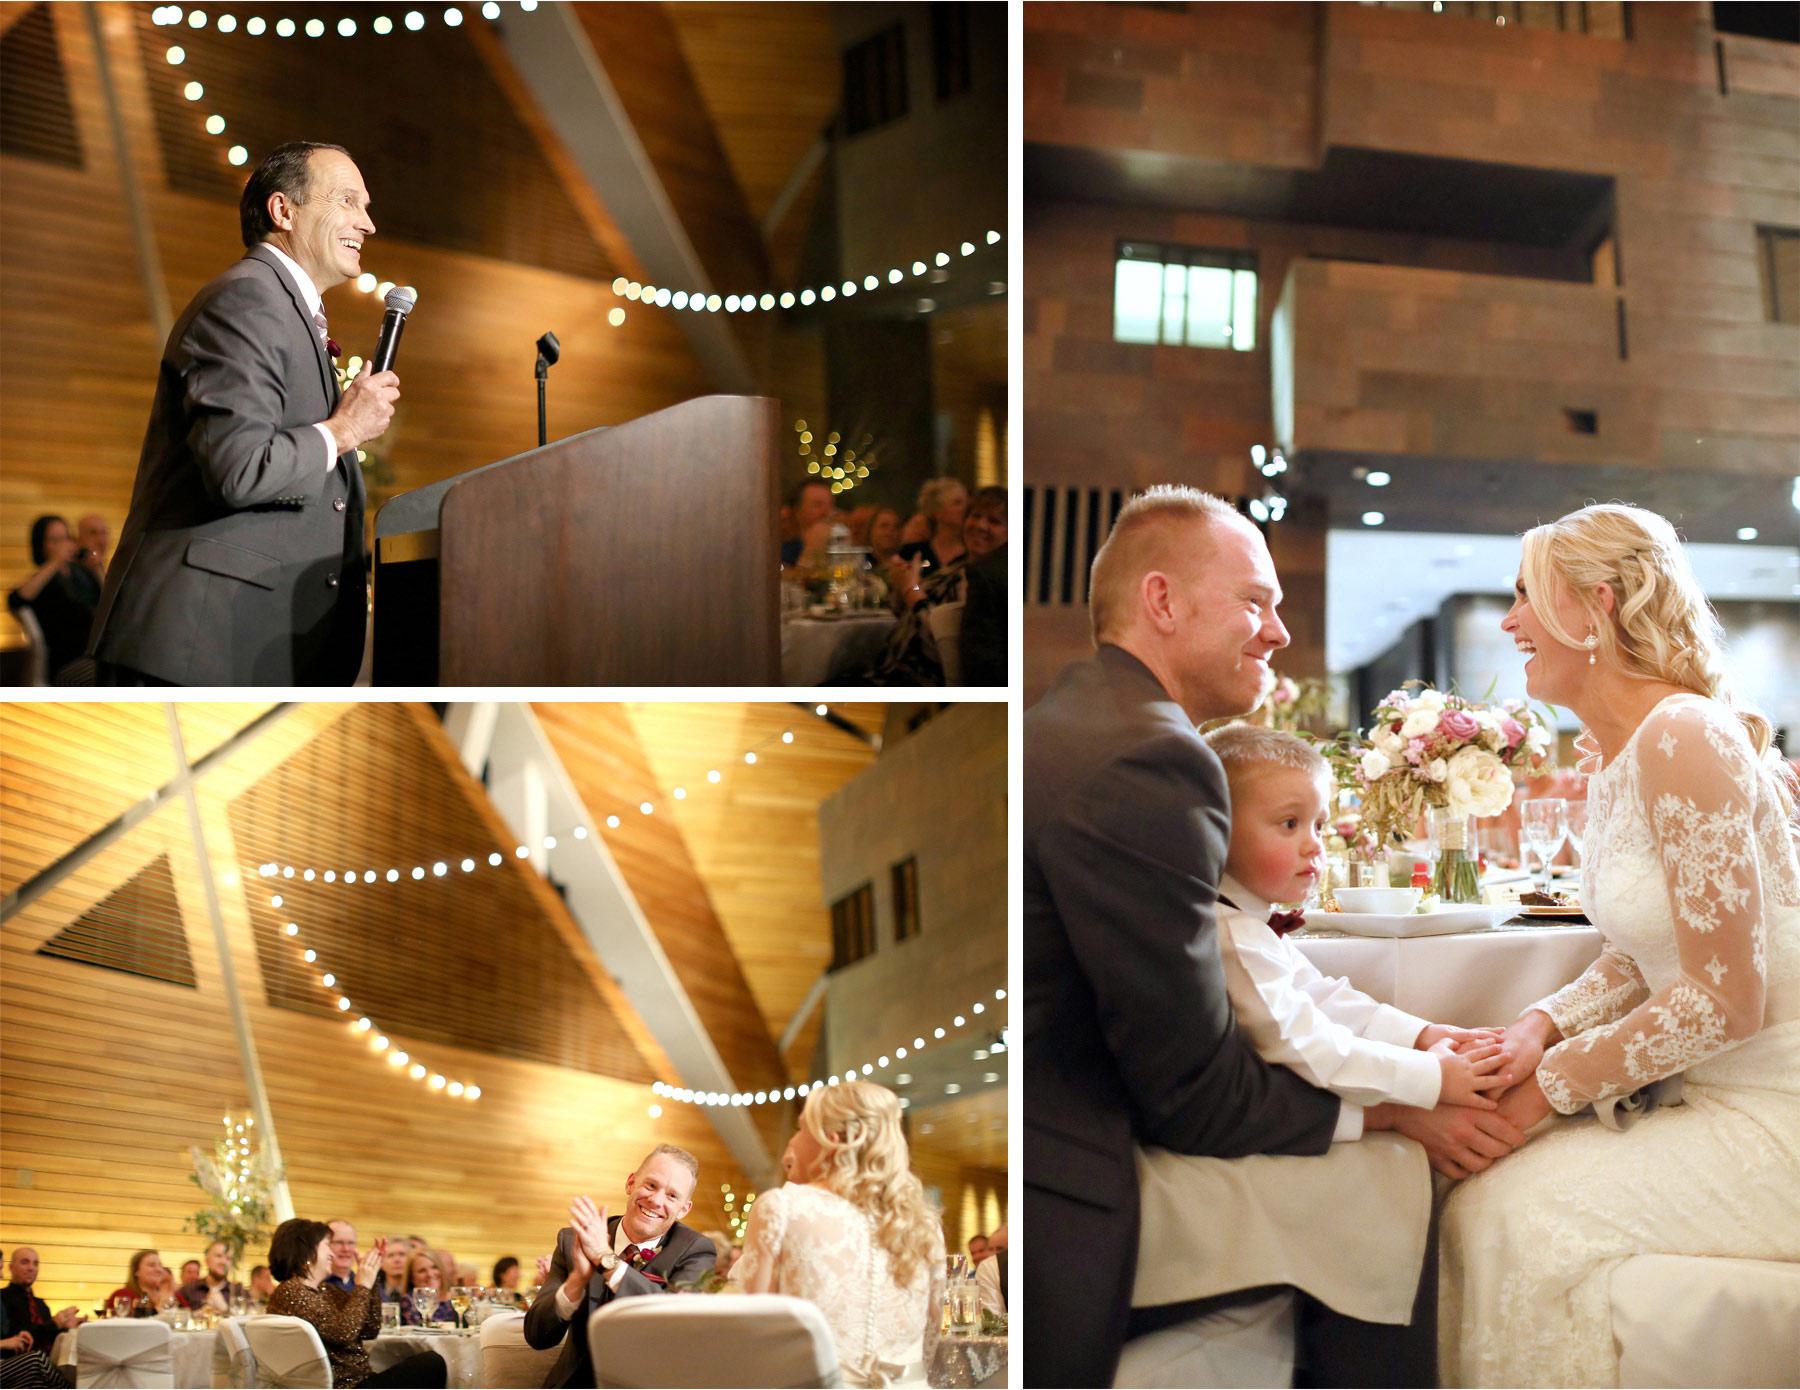 19-Minneapolis-Minnesota-Wedding-Photographer-by-Andrew-Vick-Photography-Winter-McNamara-Alumni-Center-Bride-Groom-Father-Parents-Speeches-Ring-Bearer-Brittany-and-Joseph.jpg